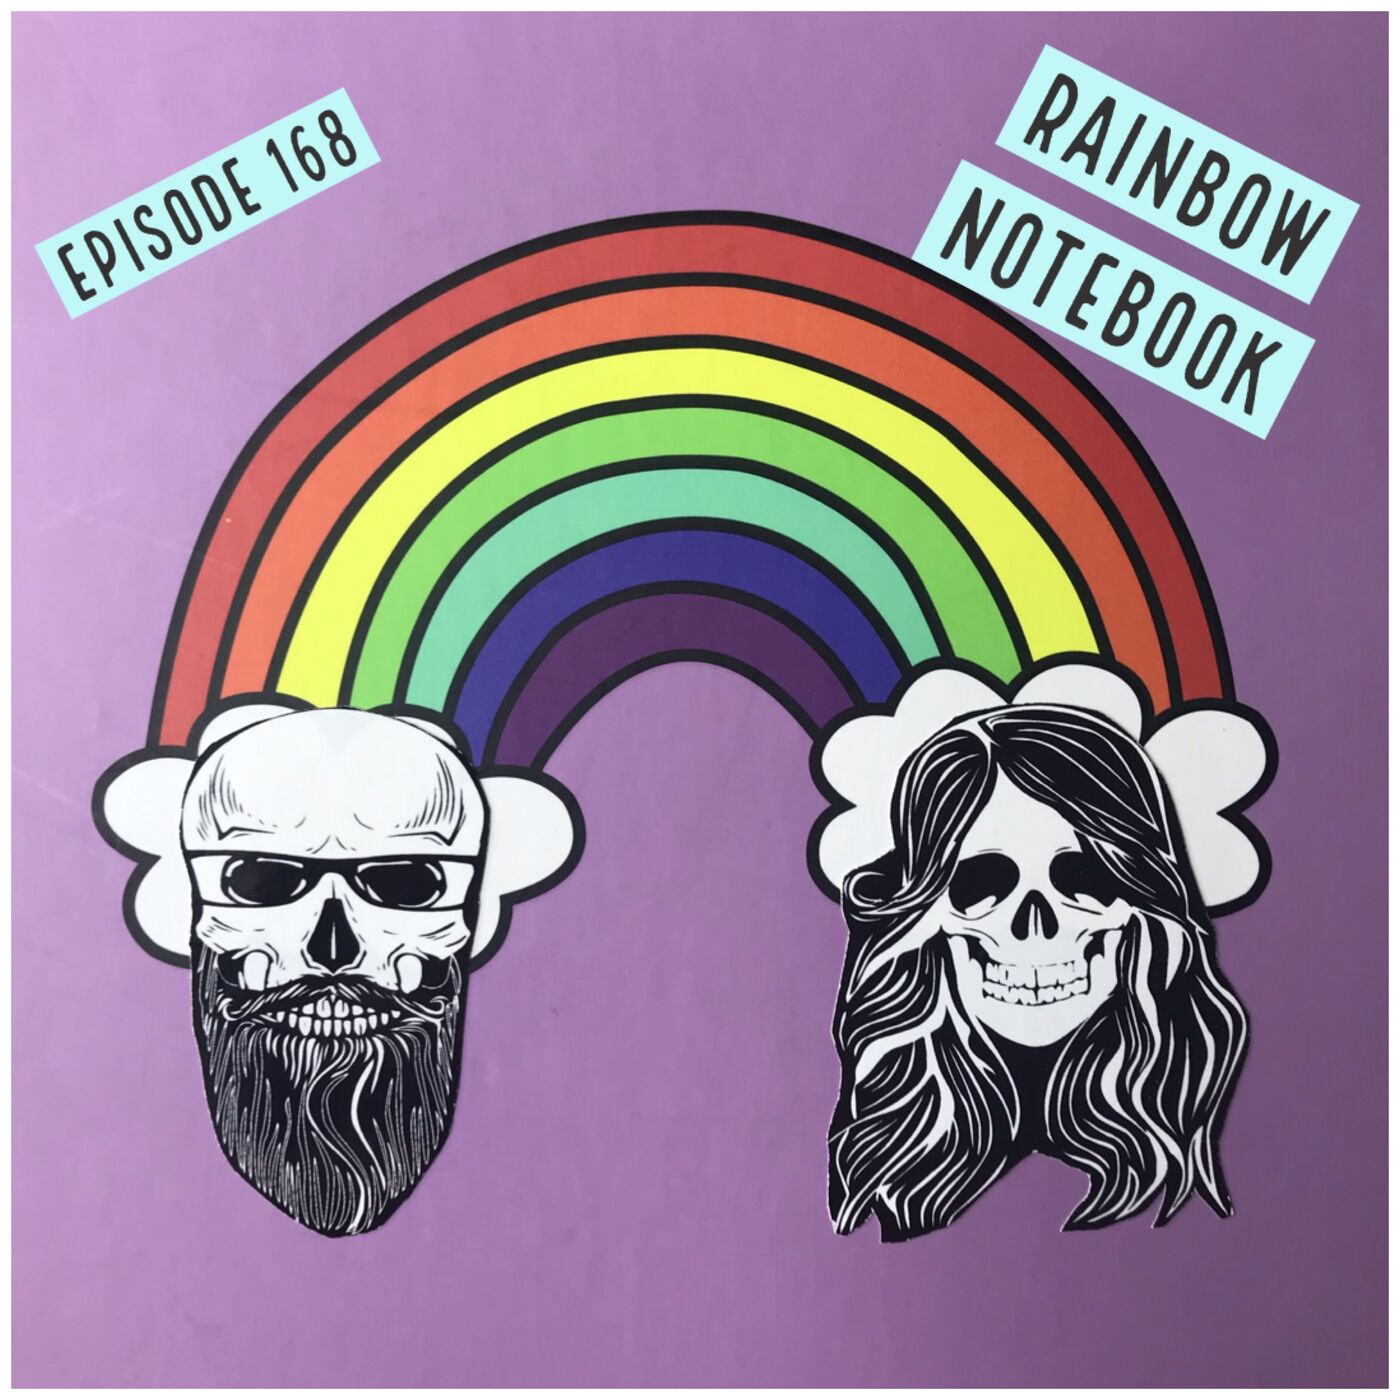 Episode 168: Rainbow Notebook